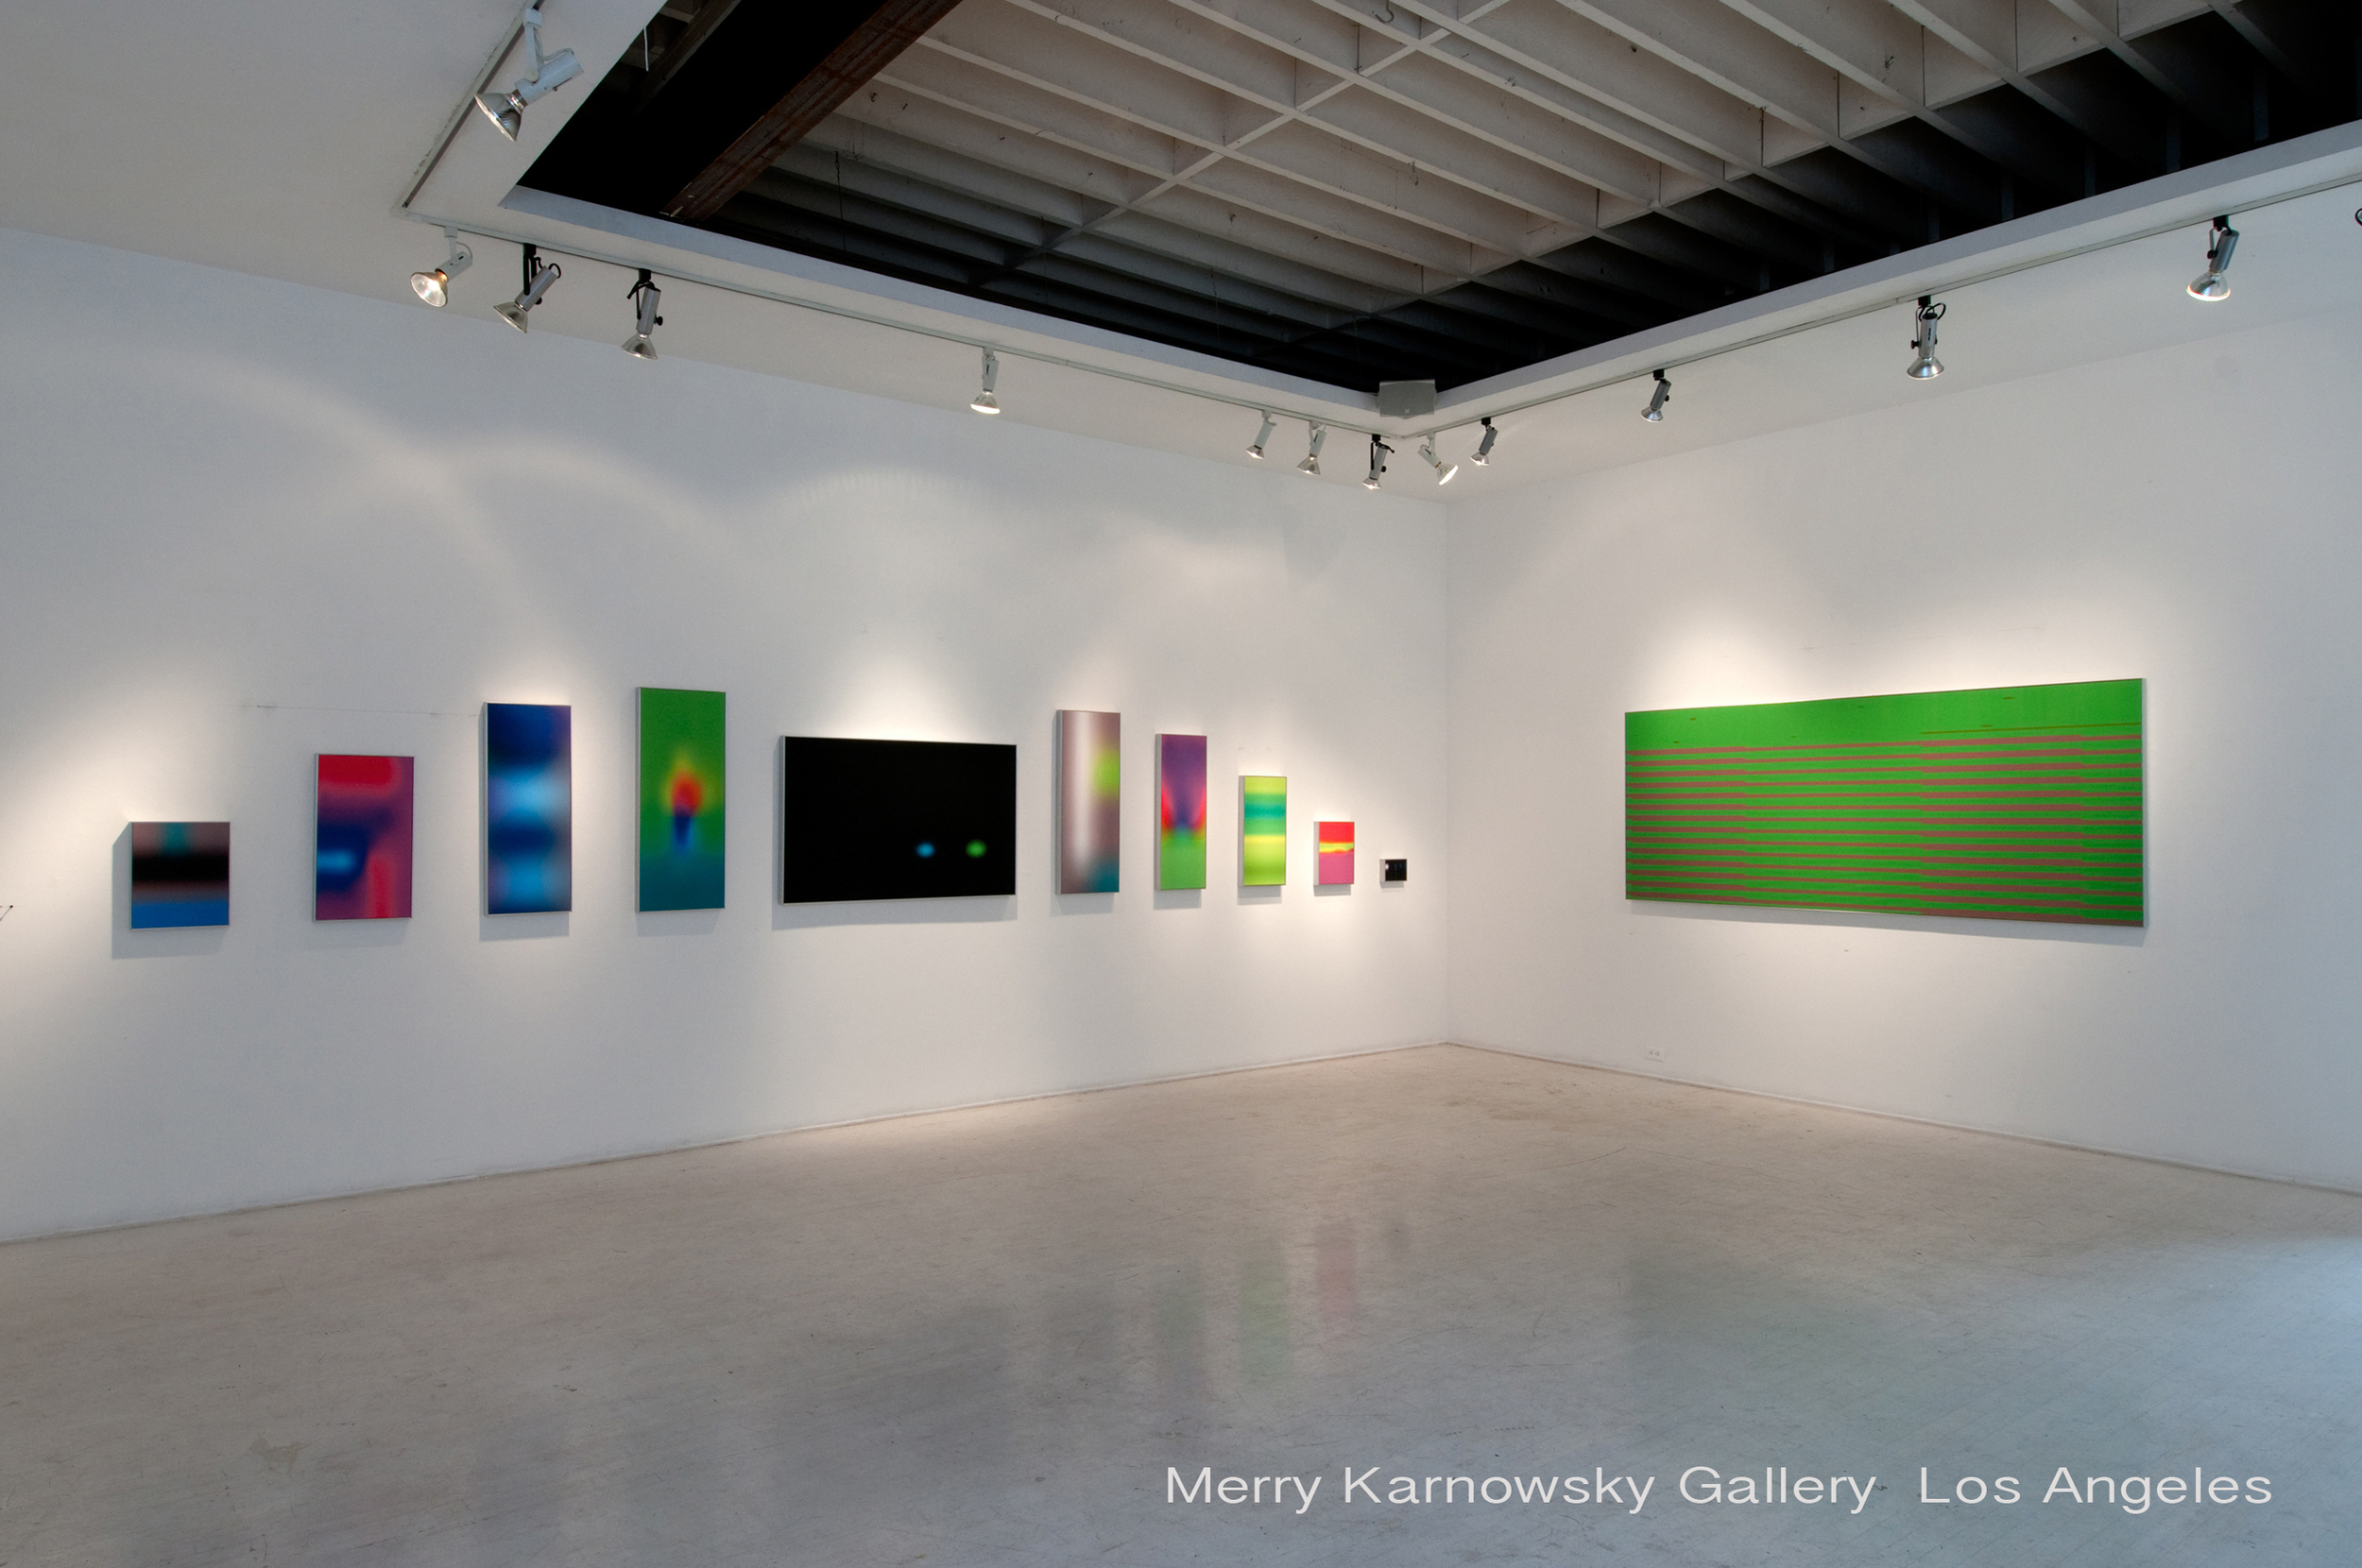 08. color beyond merry karnowski gallery 08 cropped.jpg